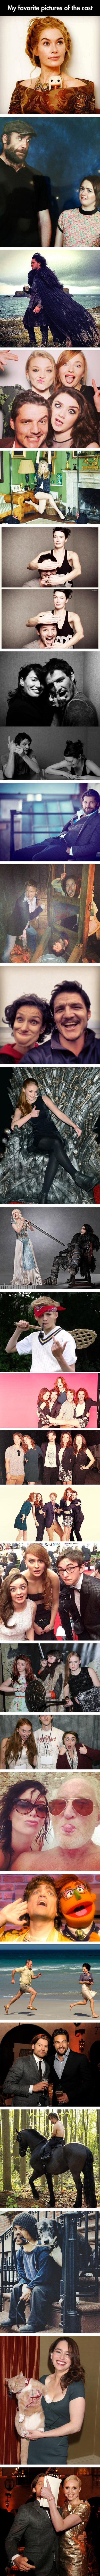 cool-favourite-GoT-pics-Cersei